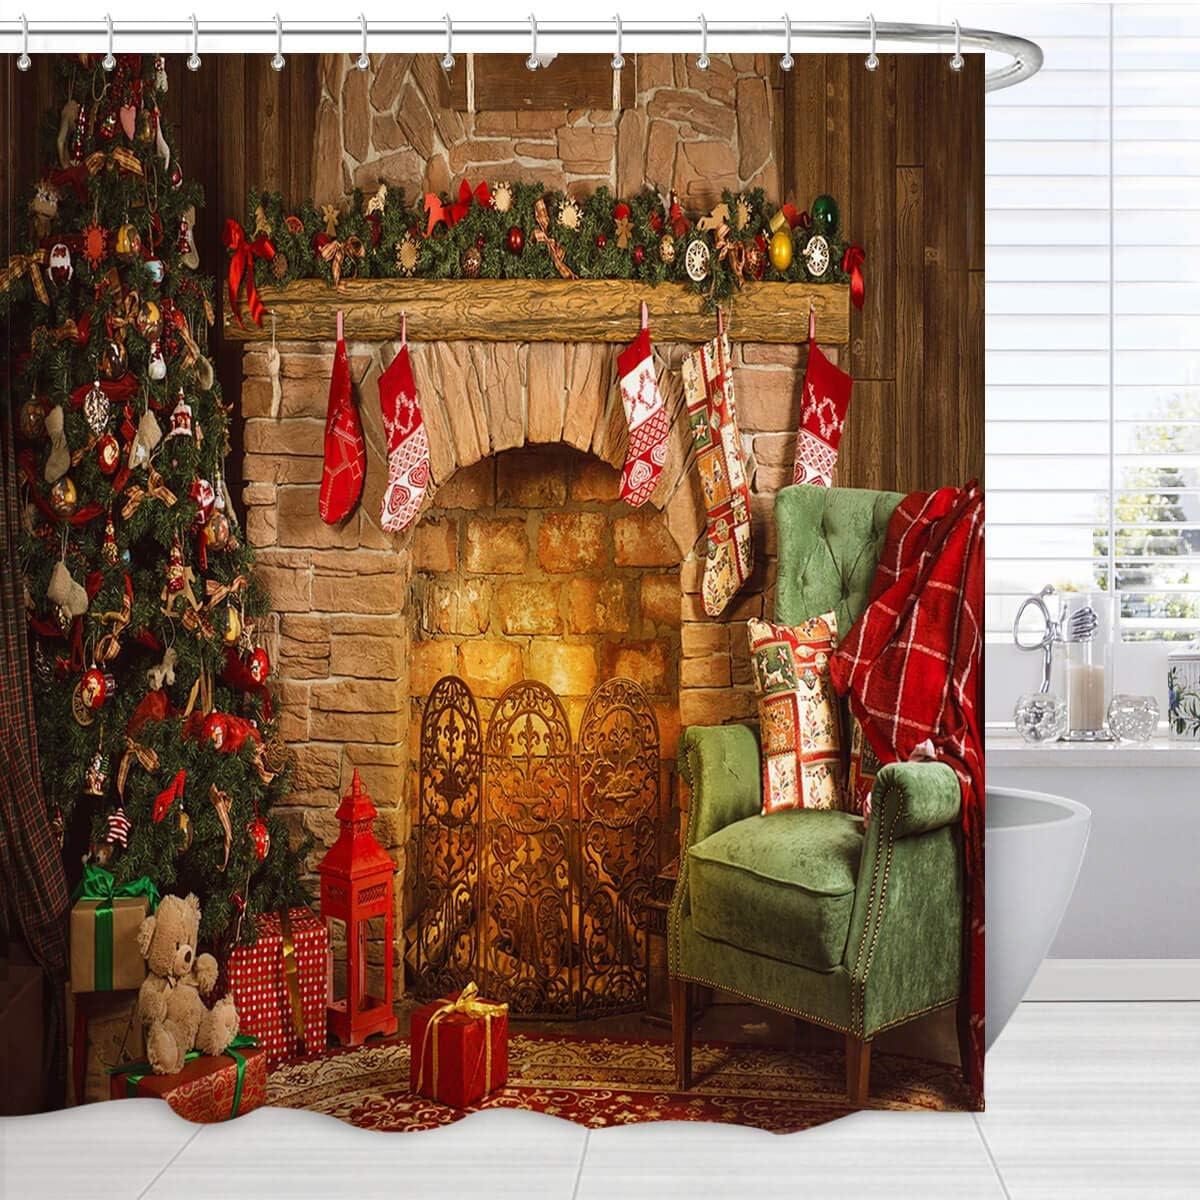 BROSHAN Christmas Bathroom Shower Curtain, Merry Christmas Tree Fireplace Stocking Gift Art Print Holiday Bath Curtain, Christmas Fabric Bathroom Decor Set with Hooks,72 x 72 Inch